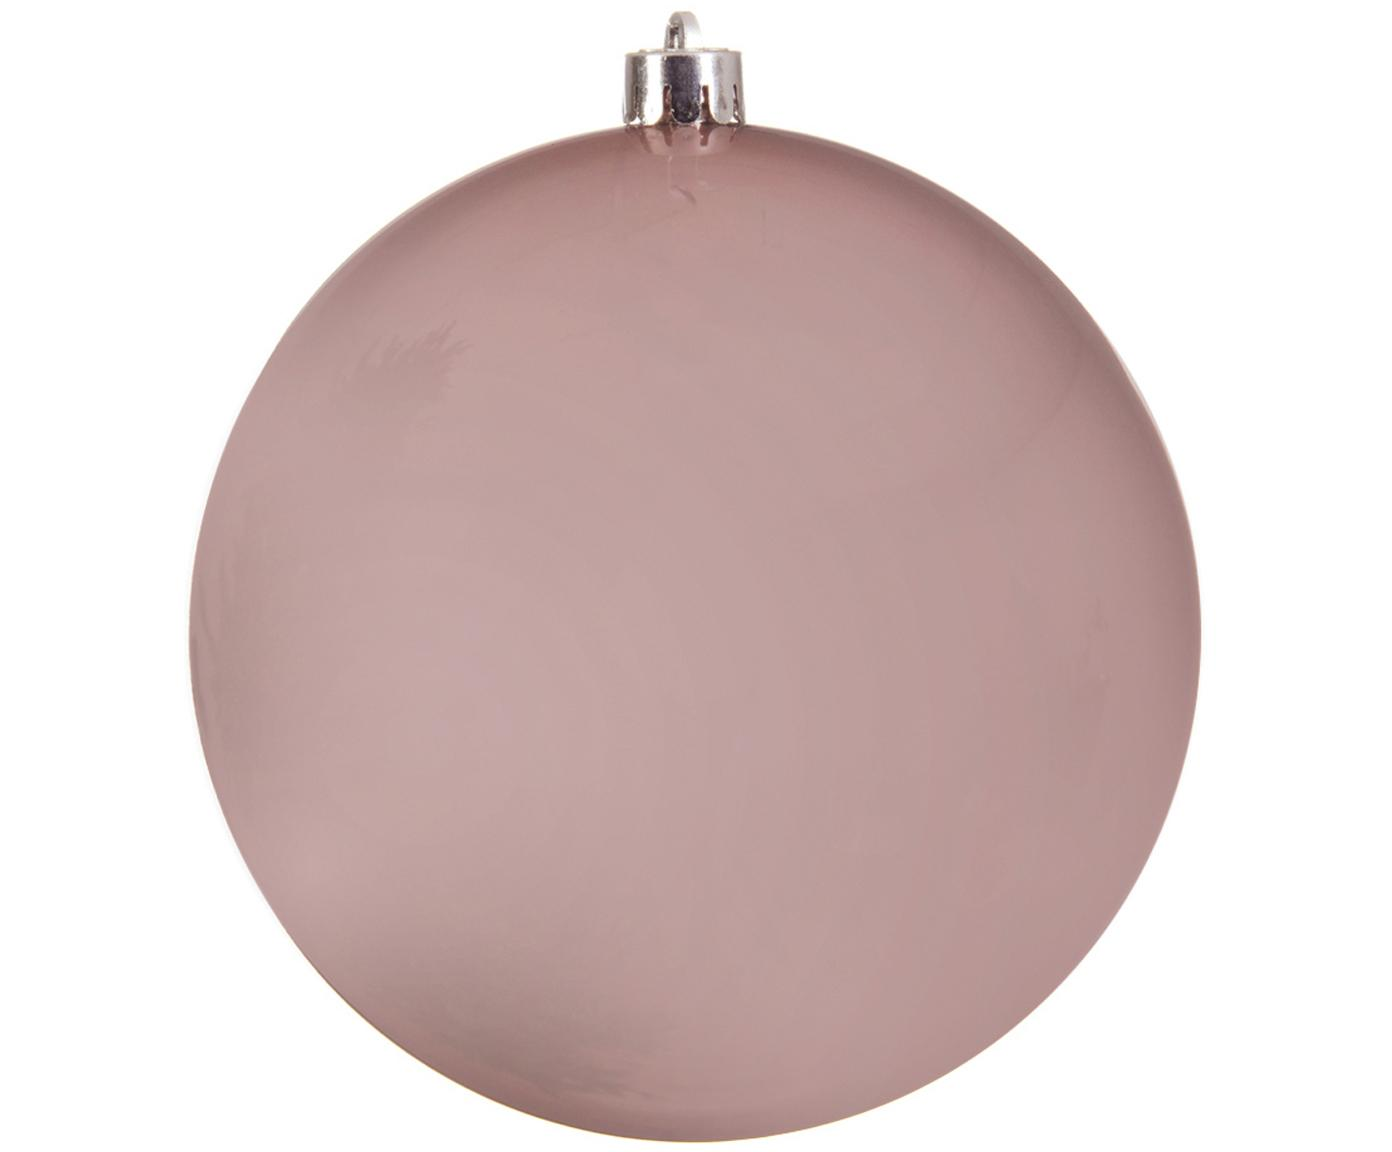 Palla di Natale Minstix, Materiale sintetico, Rosa, Ø 20 cm